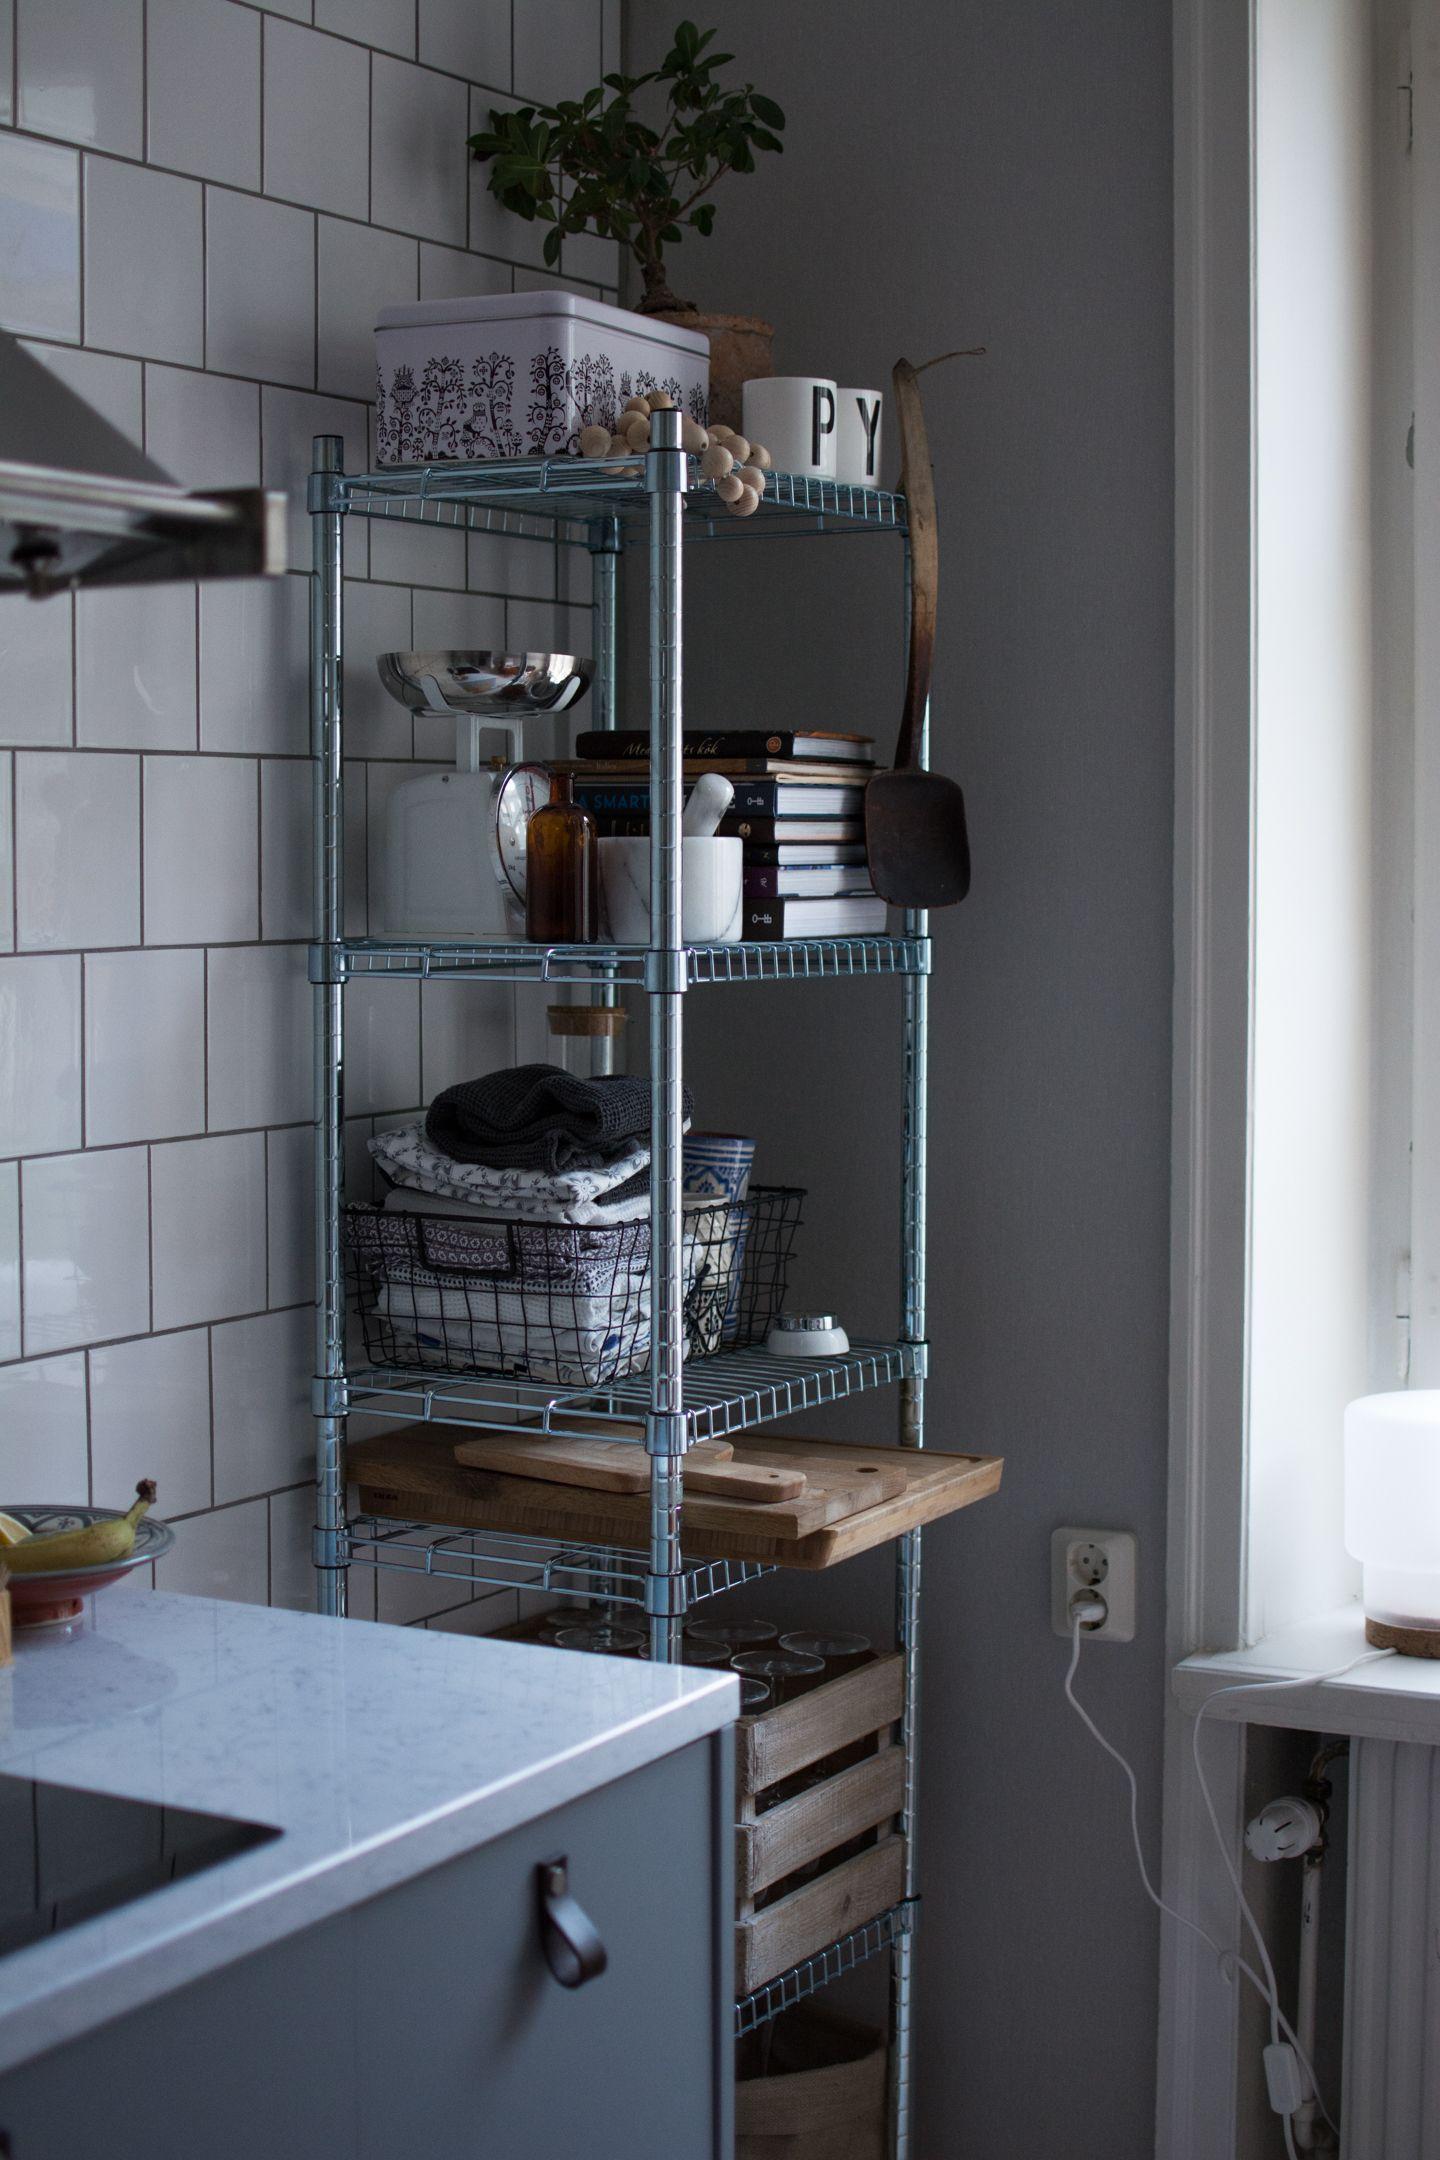 Bildresultat för omar hylla ikea | A. Kitchen | Pinterest ...